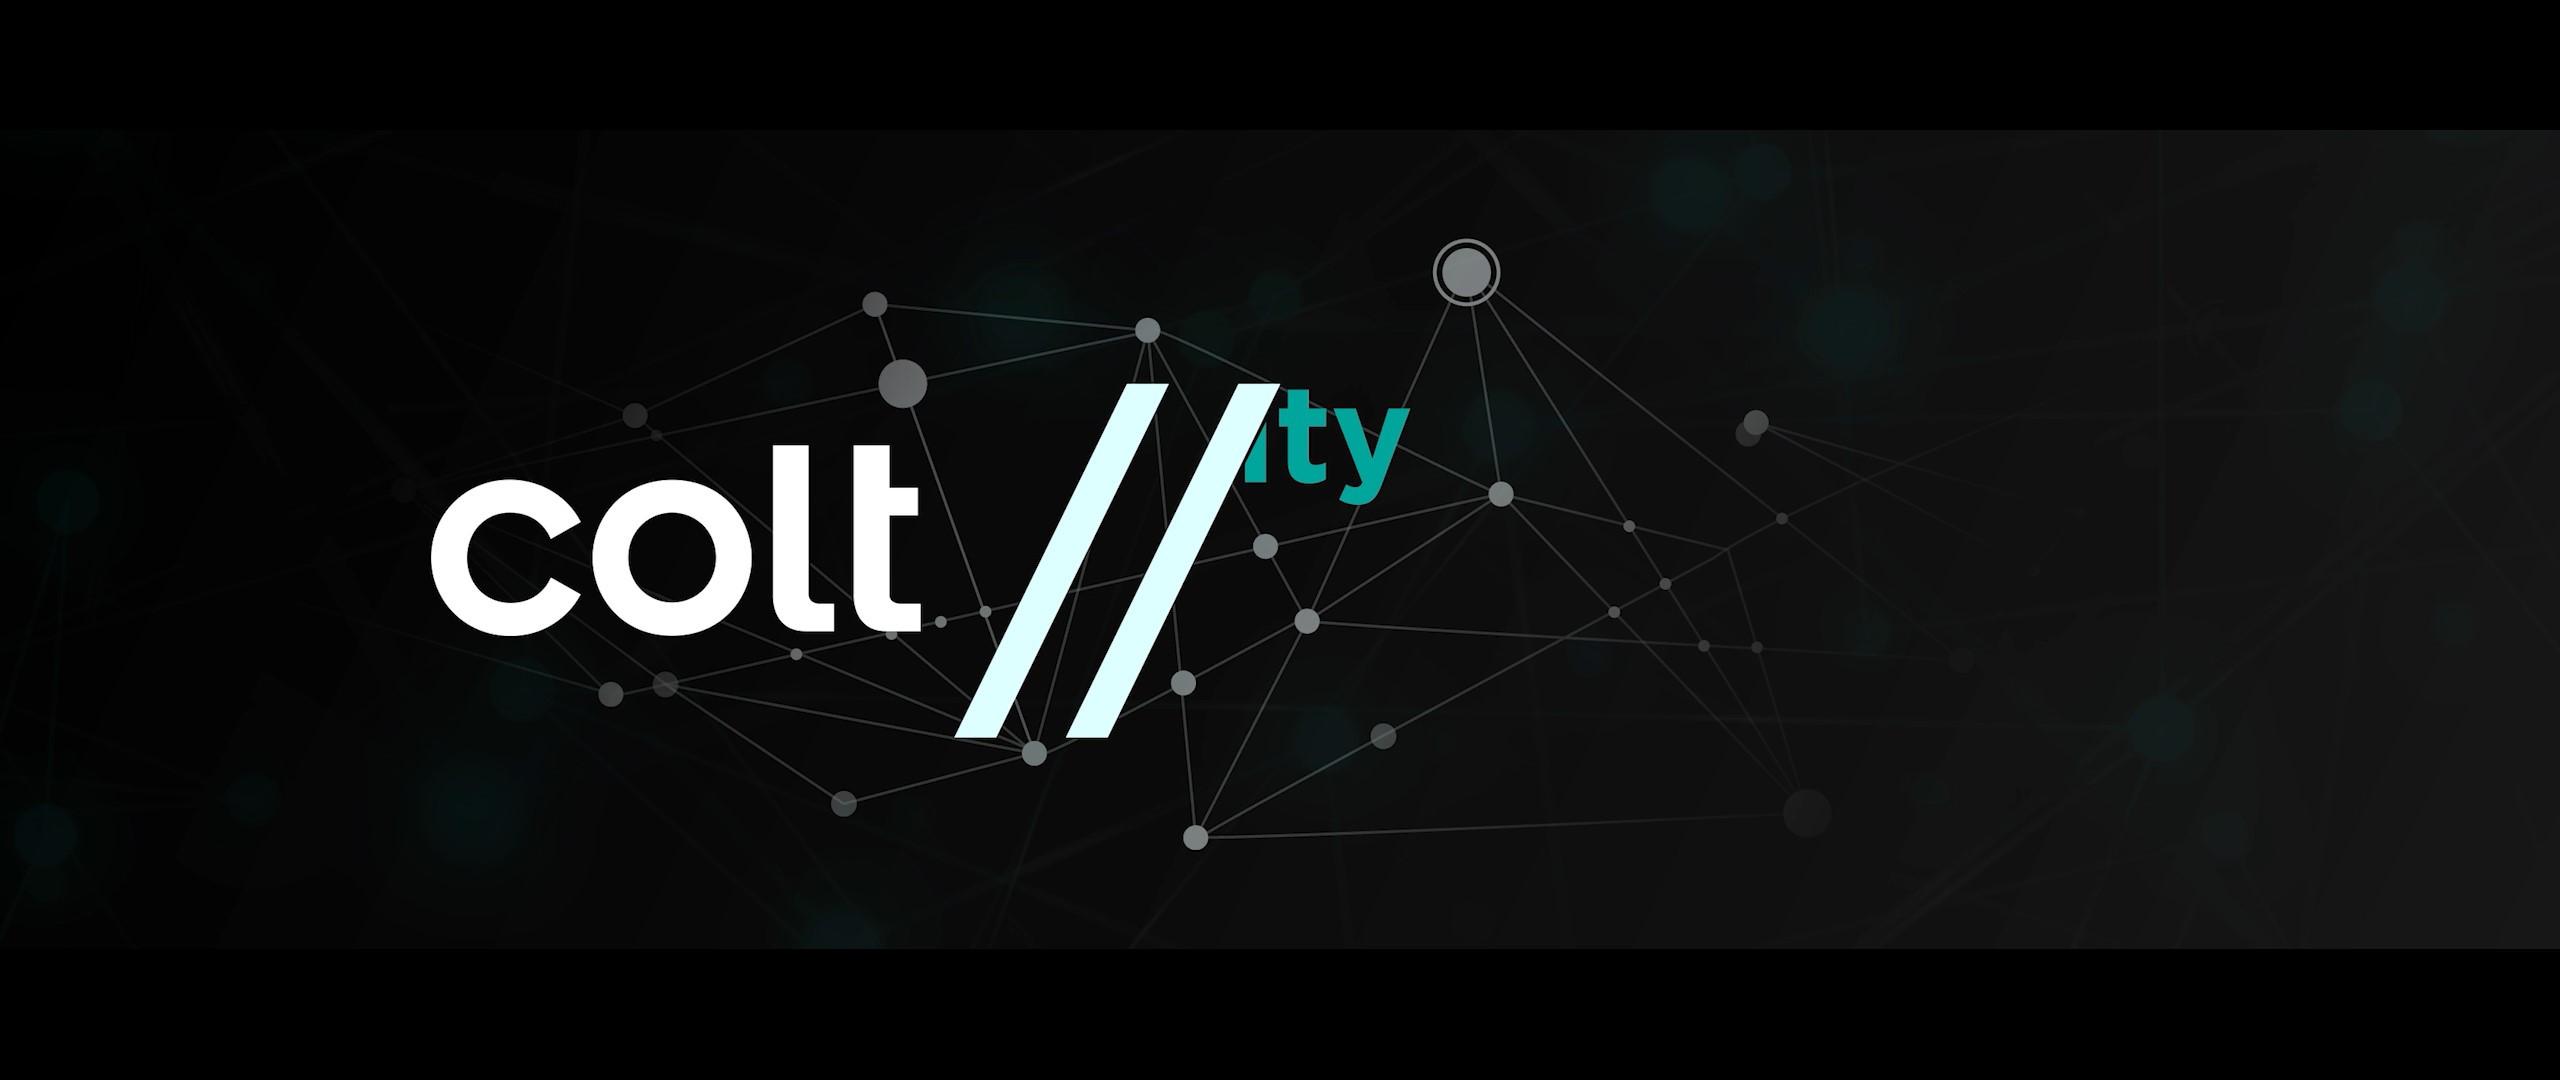 Colt_03